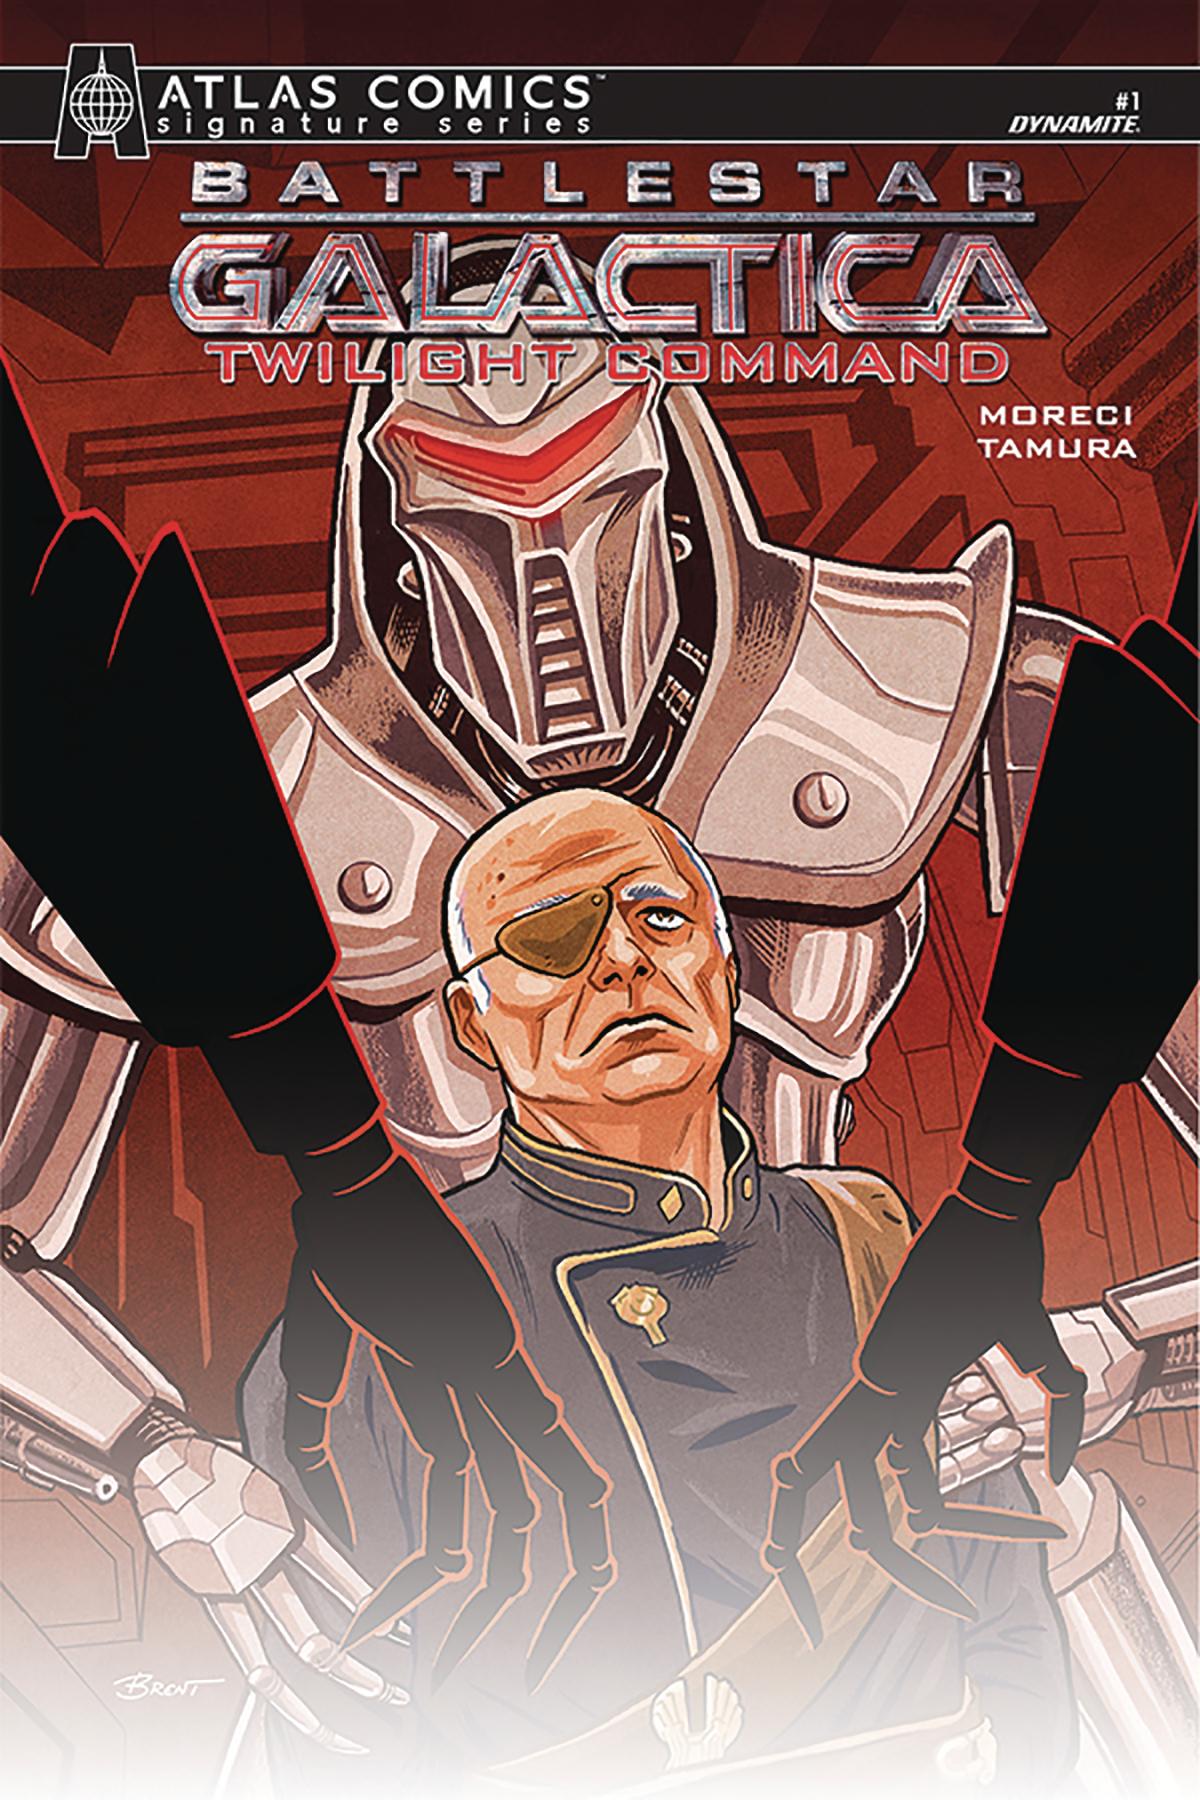 BATTLESTAR GALACTICA TWILIGHT COMMAND #1 SGN ATLAS ED